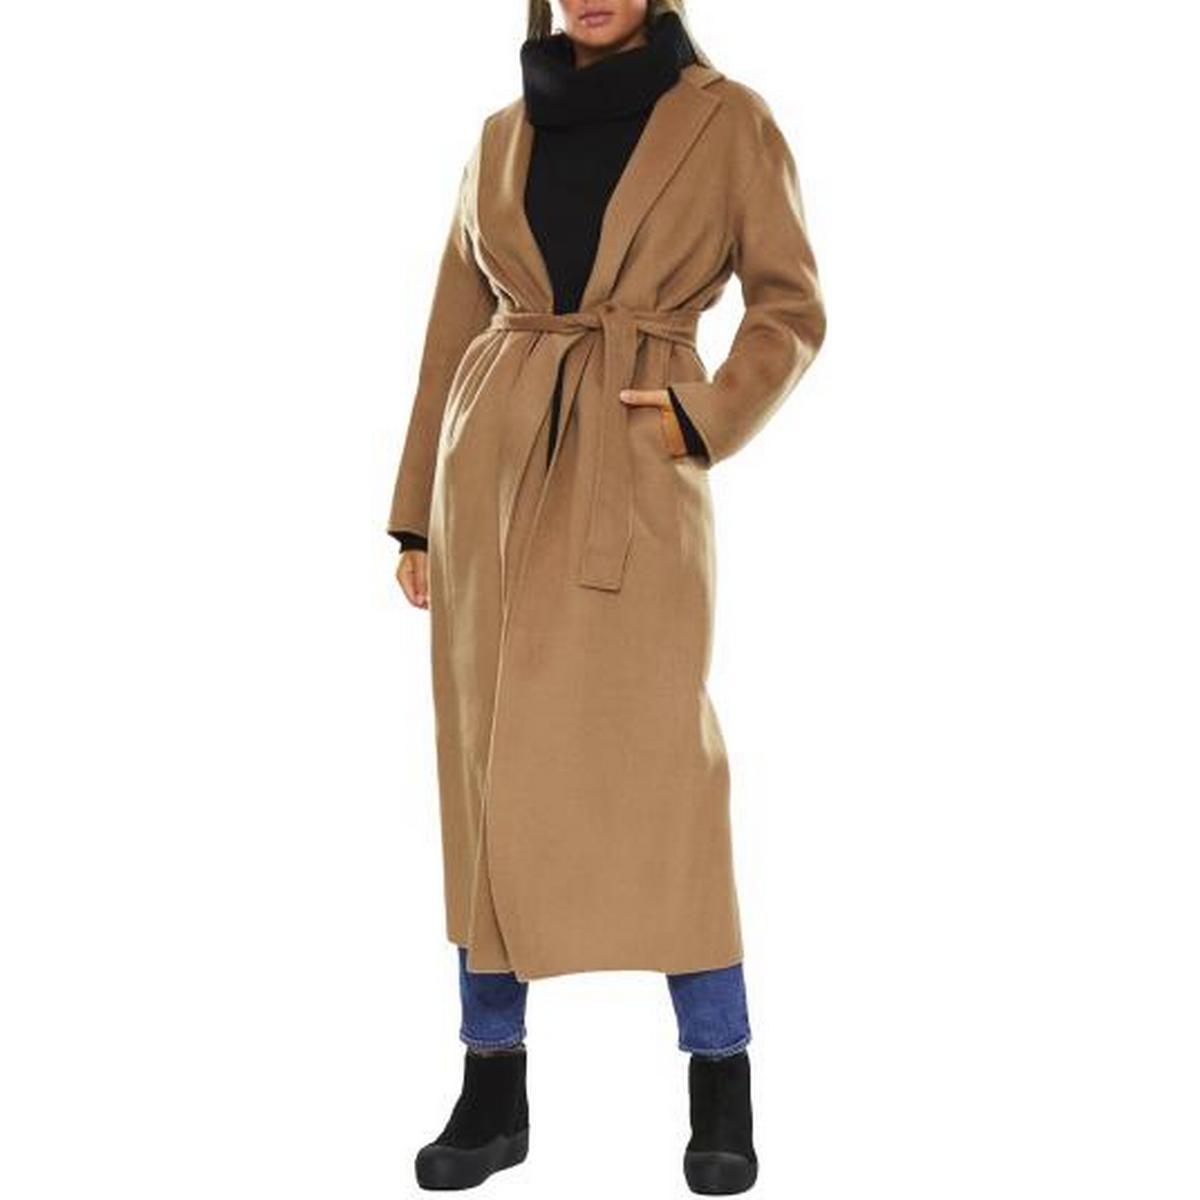 Filippa K Overtøj Dametøj (82 produkter) • Se billigste pris